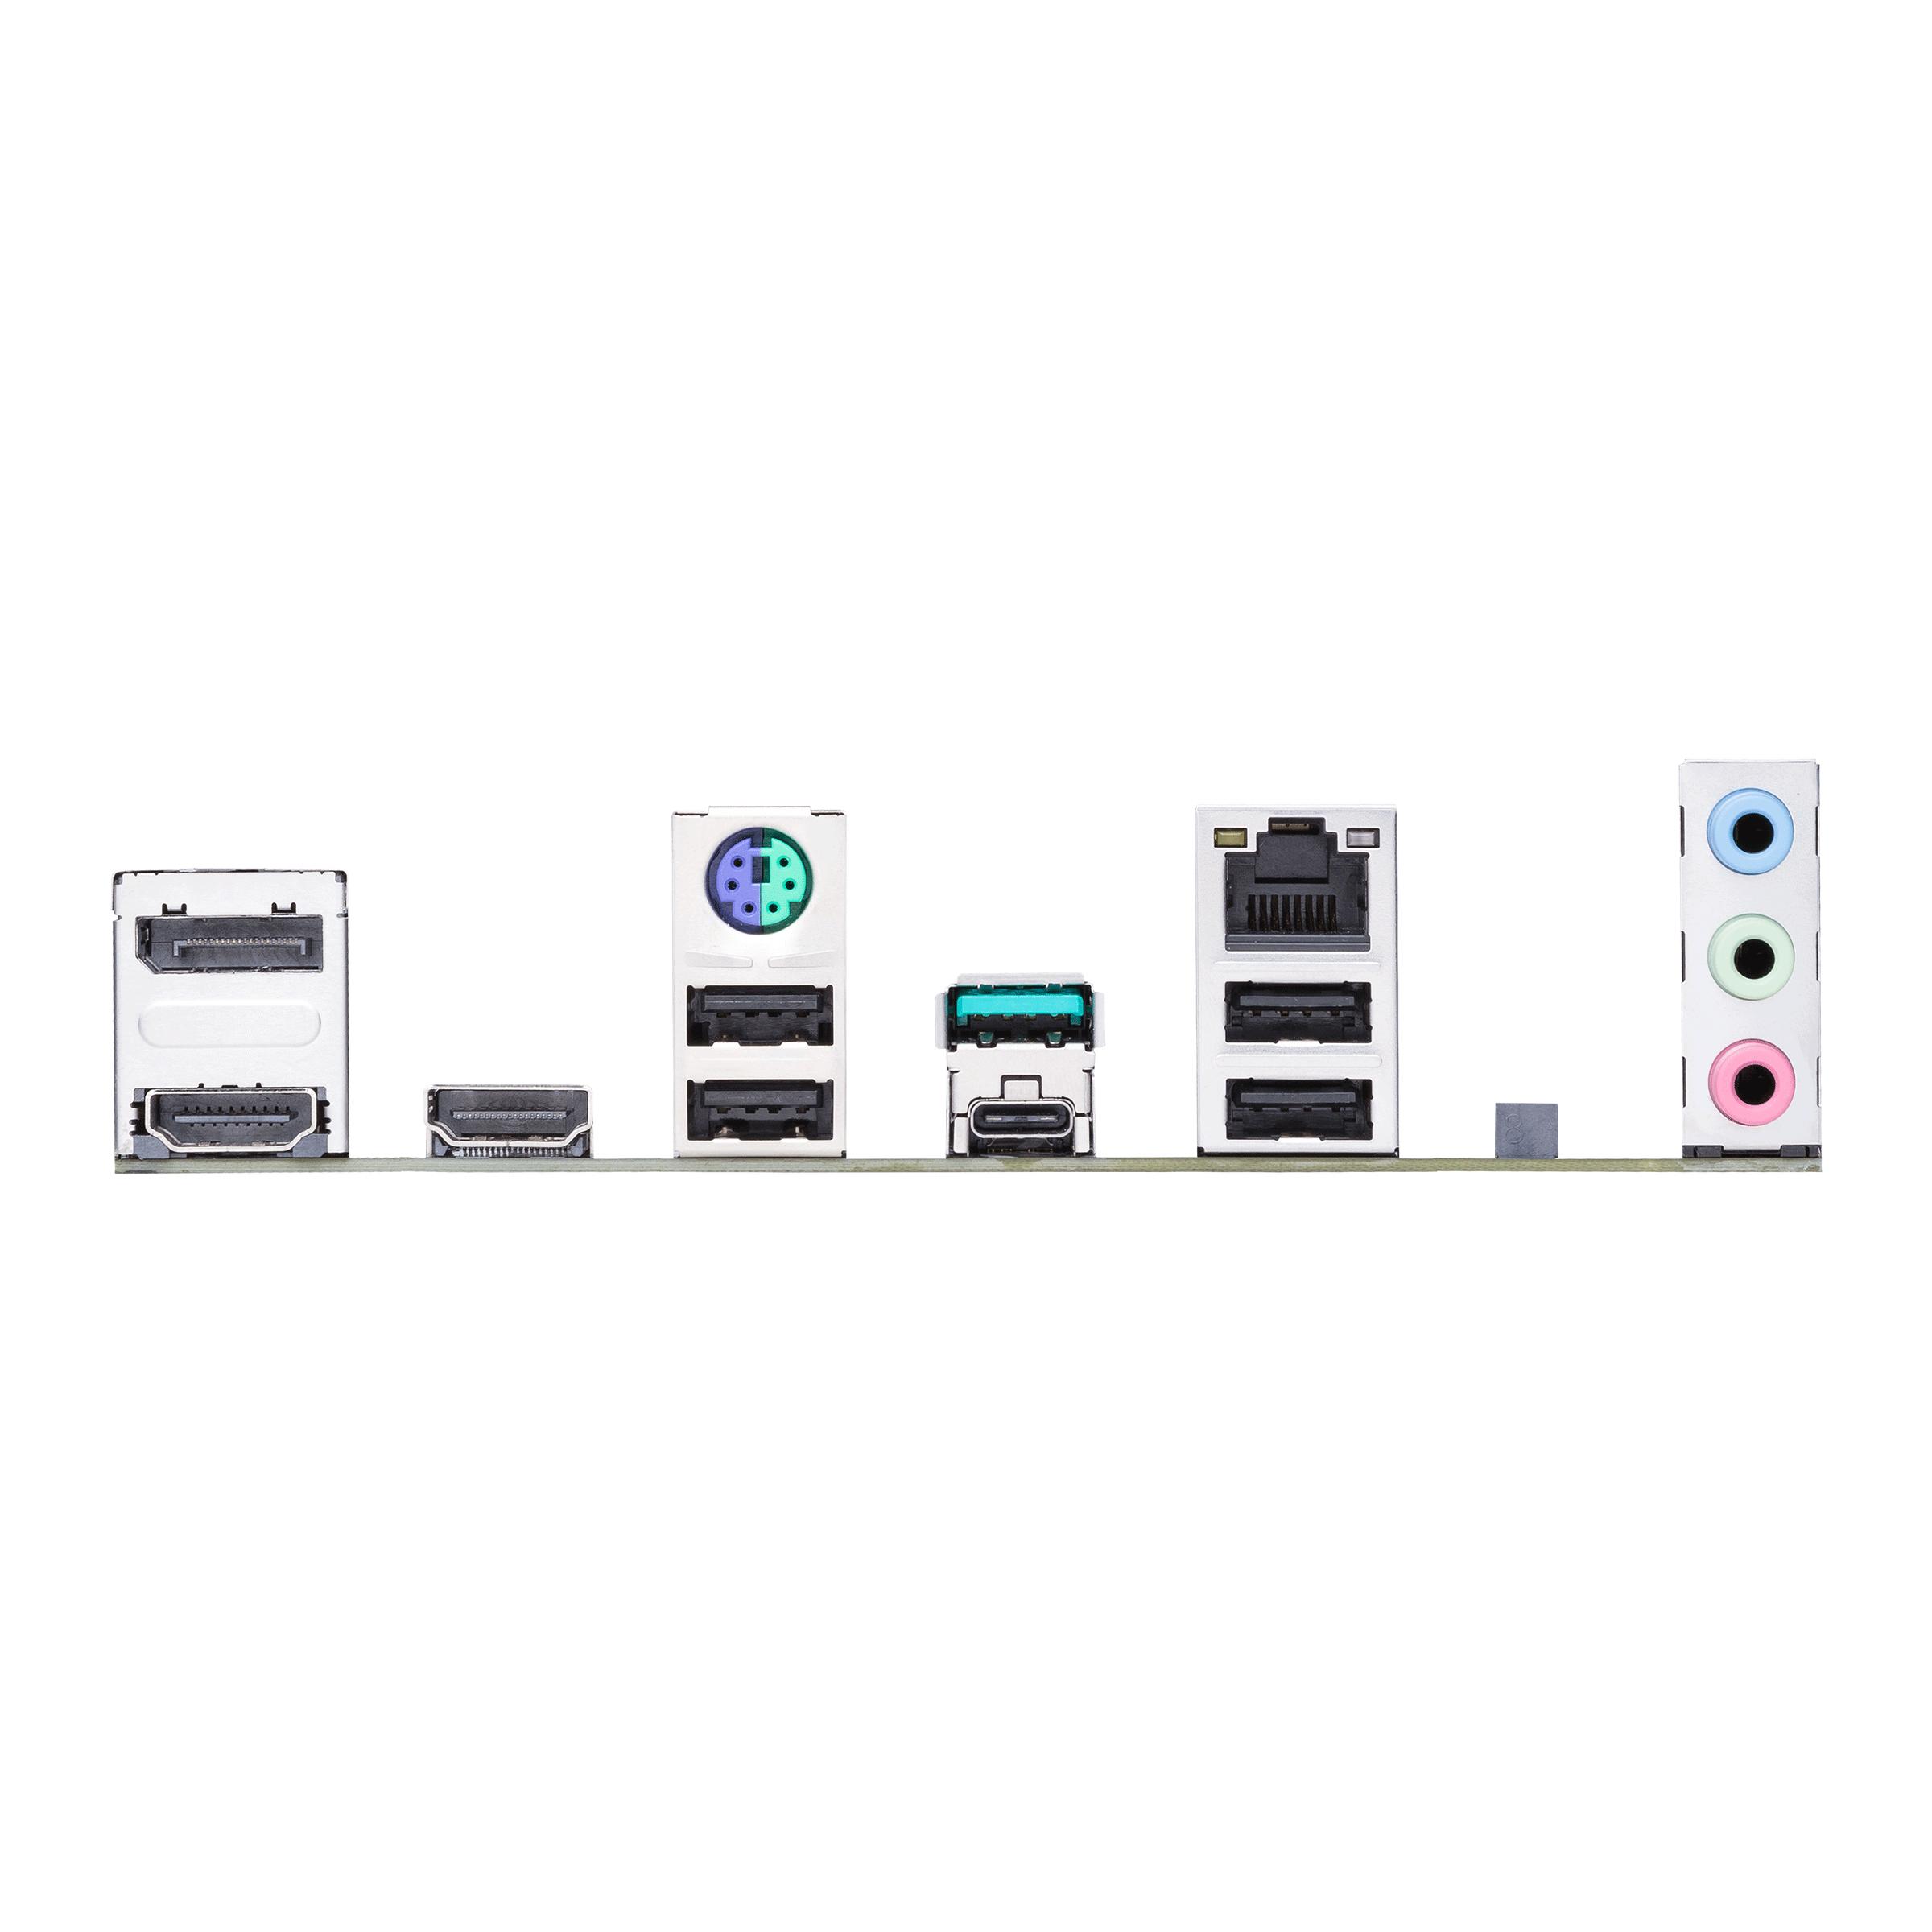 ASUS PRIME B560M-A - Motherboard - micro ATX - LGA1200-Sockel - B560 - USB-C Gen2, USB 3.2 Gen 1, USB 3.2 Gen 2 - Gigabit LAN - Onboard-Grafik (CPU erforderlich)